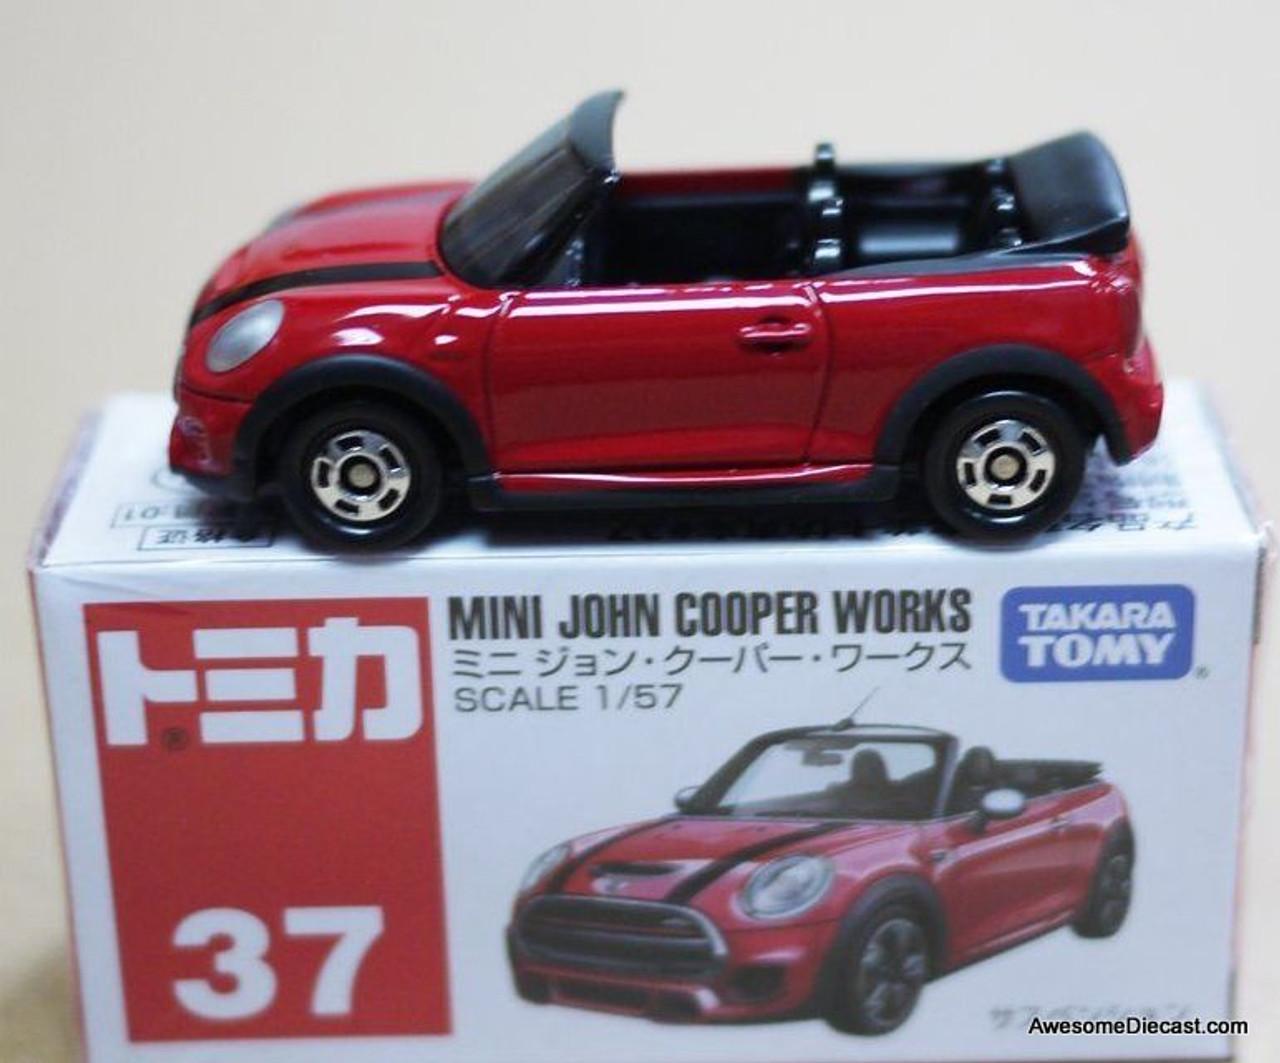 Tomica 1:57 Mini Convertible, Red 'John Cooper Works'